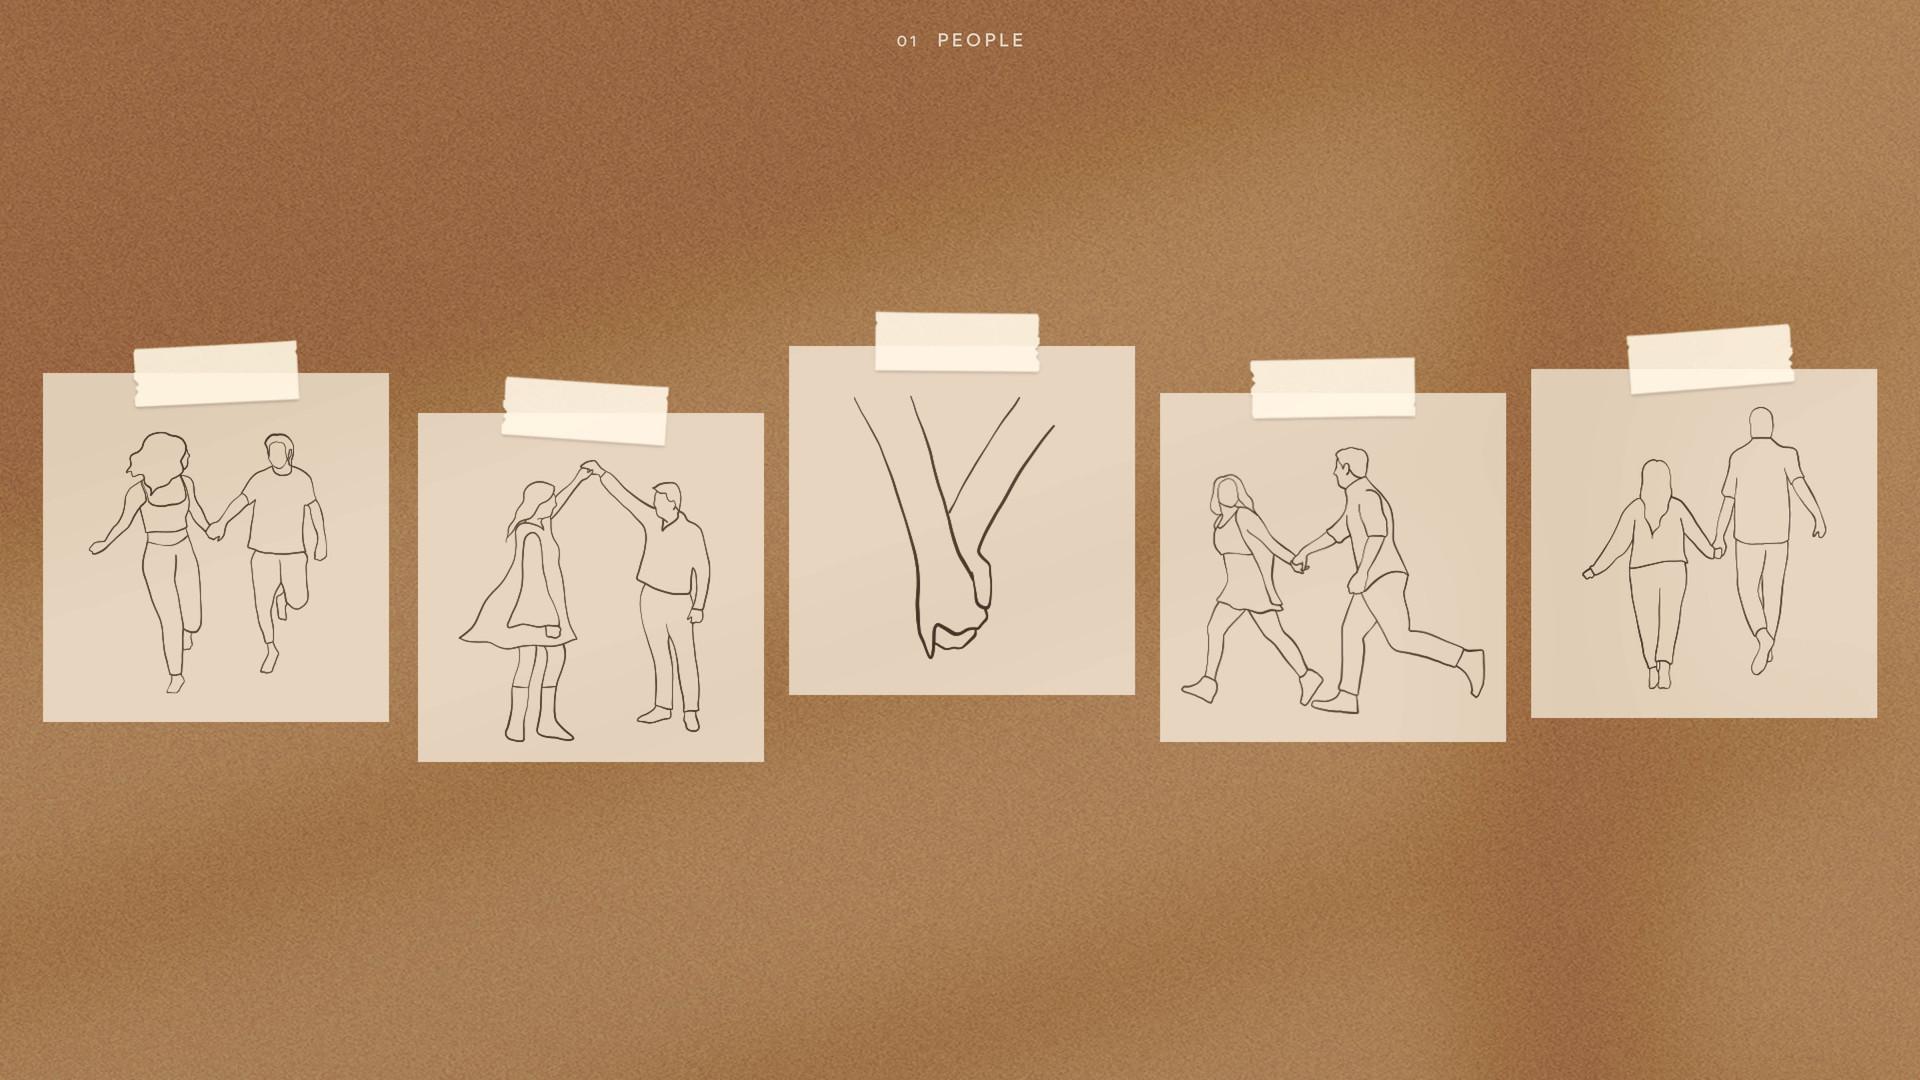 people holding hands running illustration